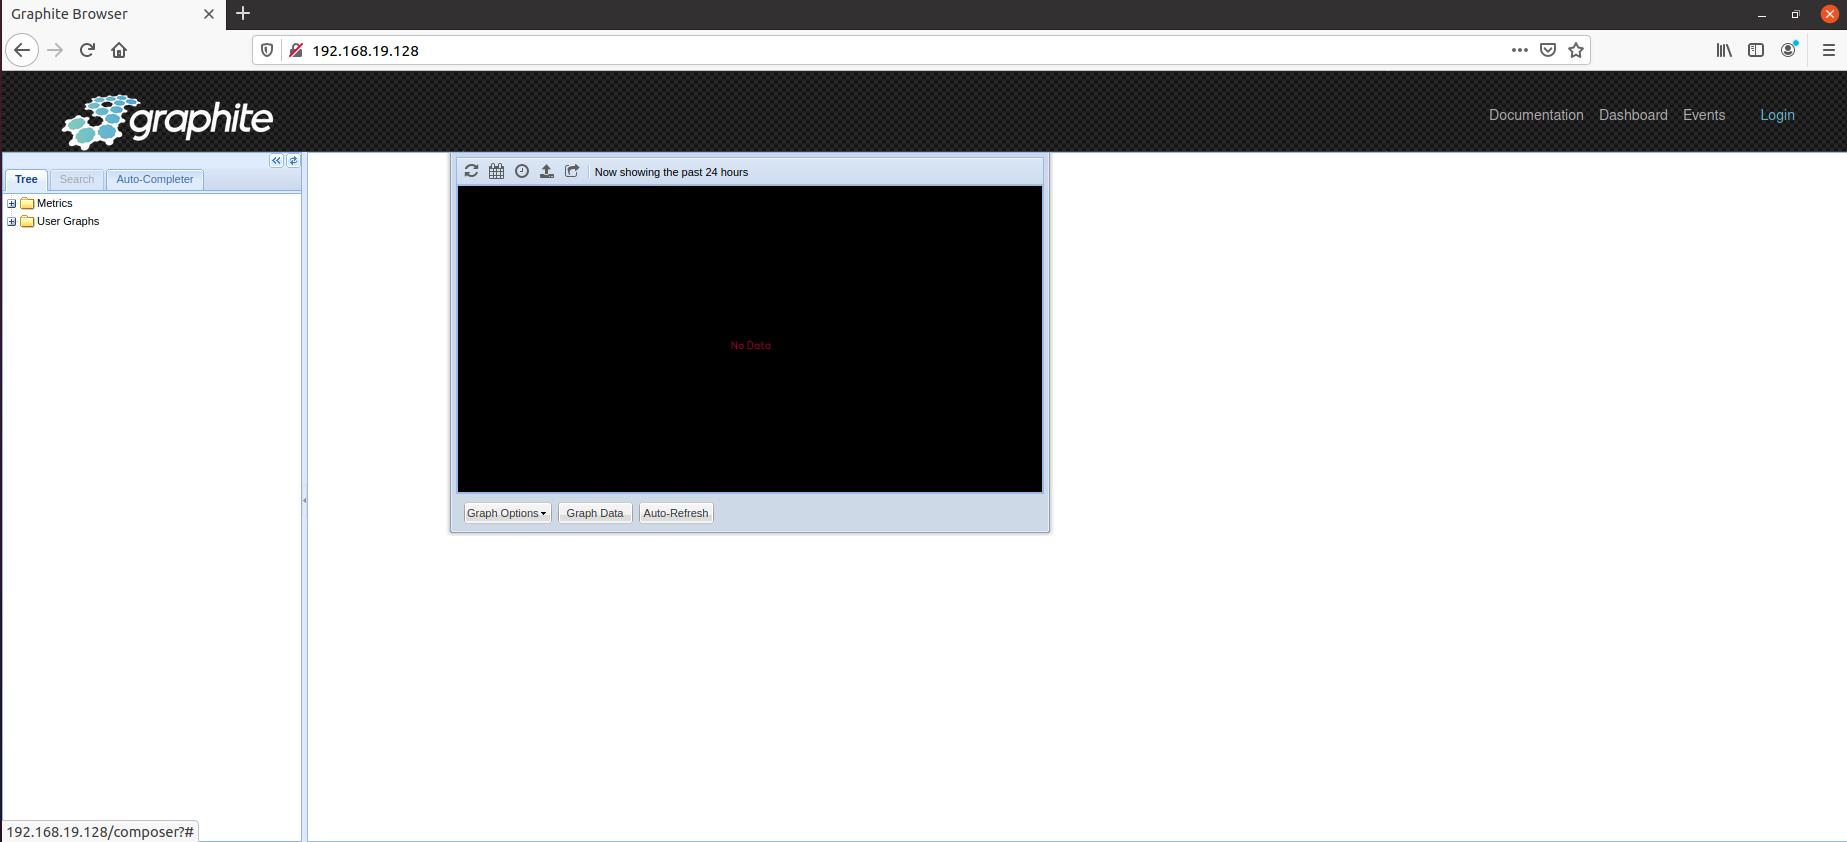 How To Install Graphite & Graphite Web On Ubuntu 20.04